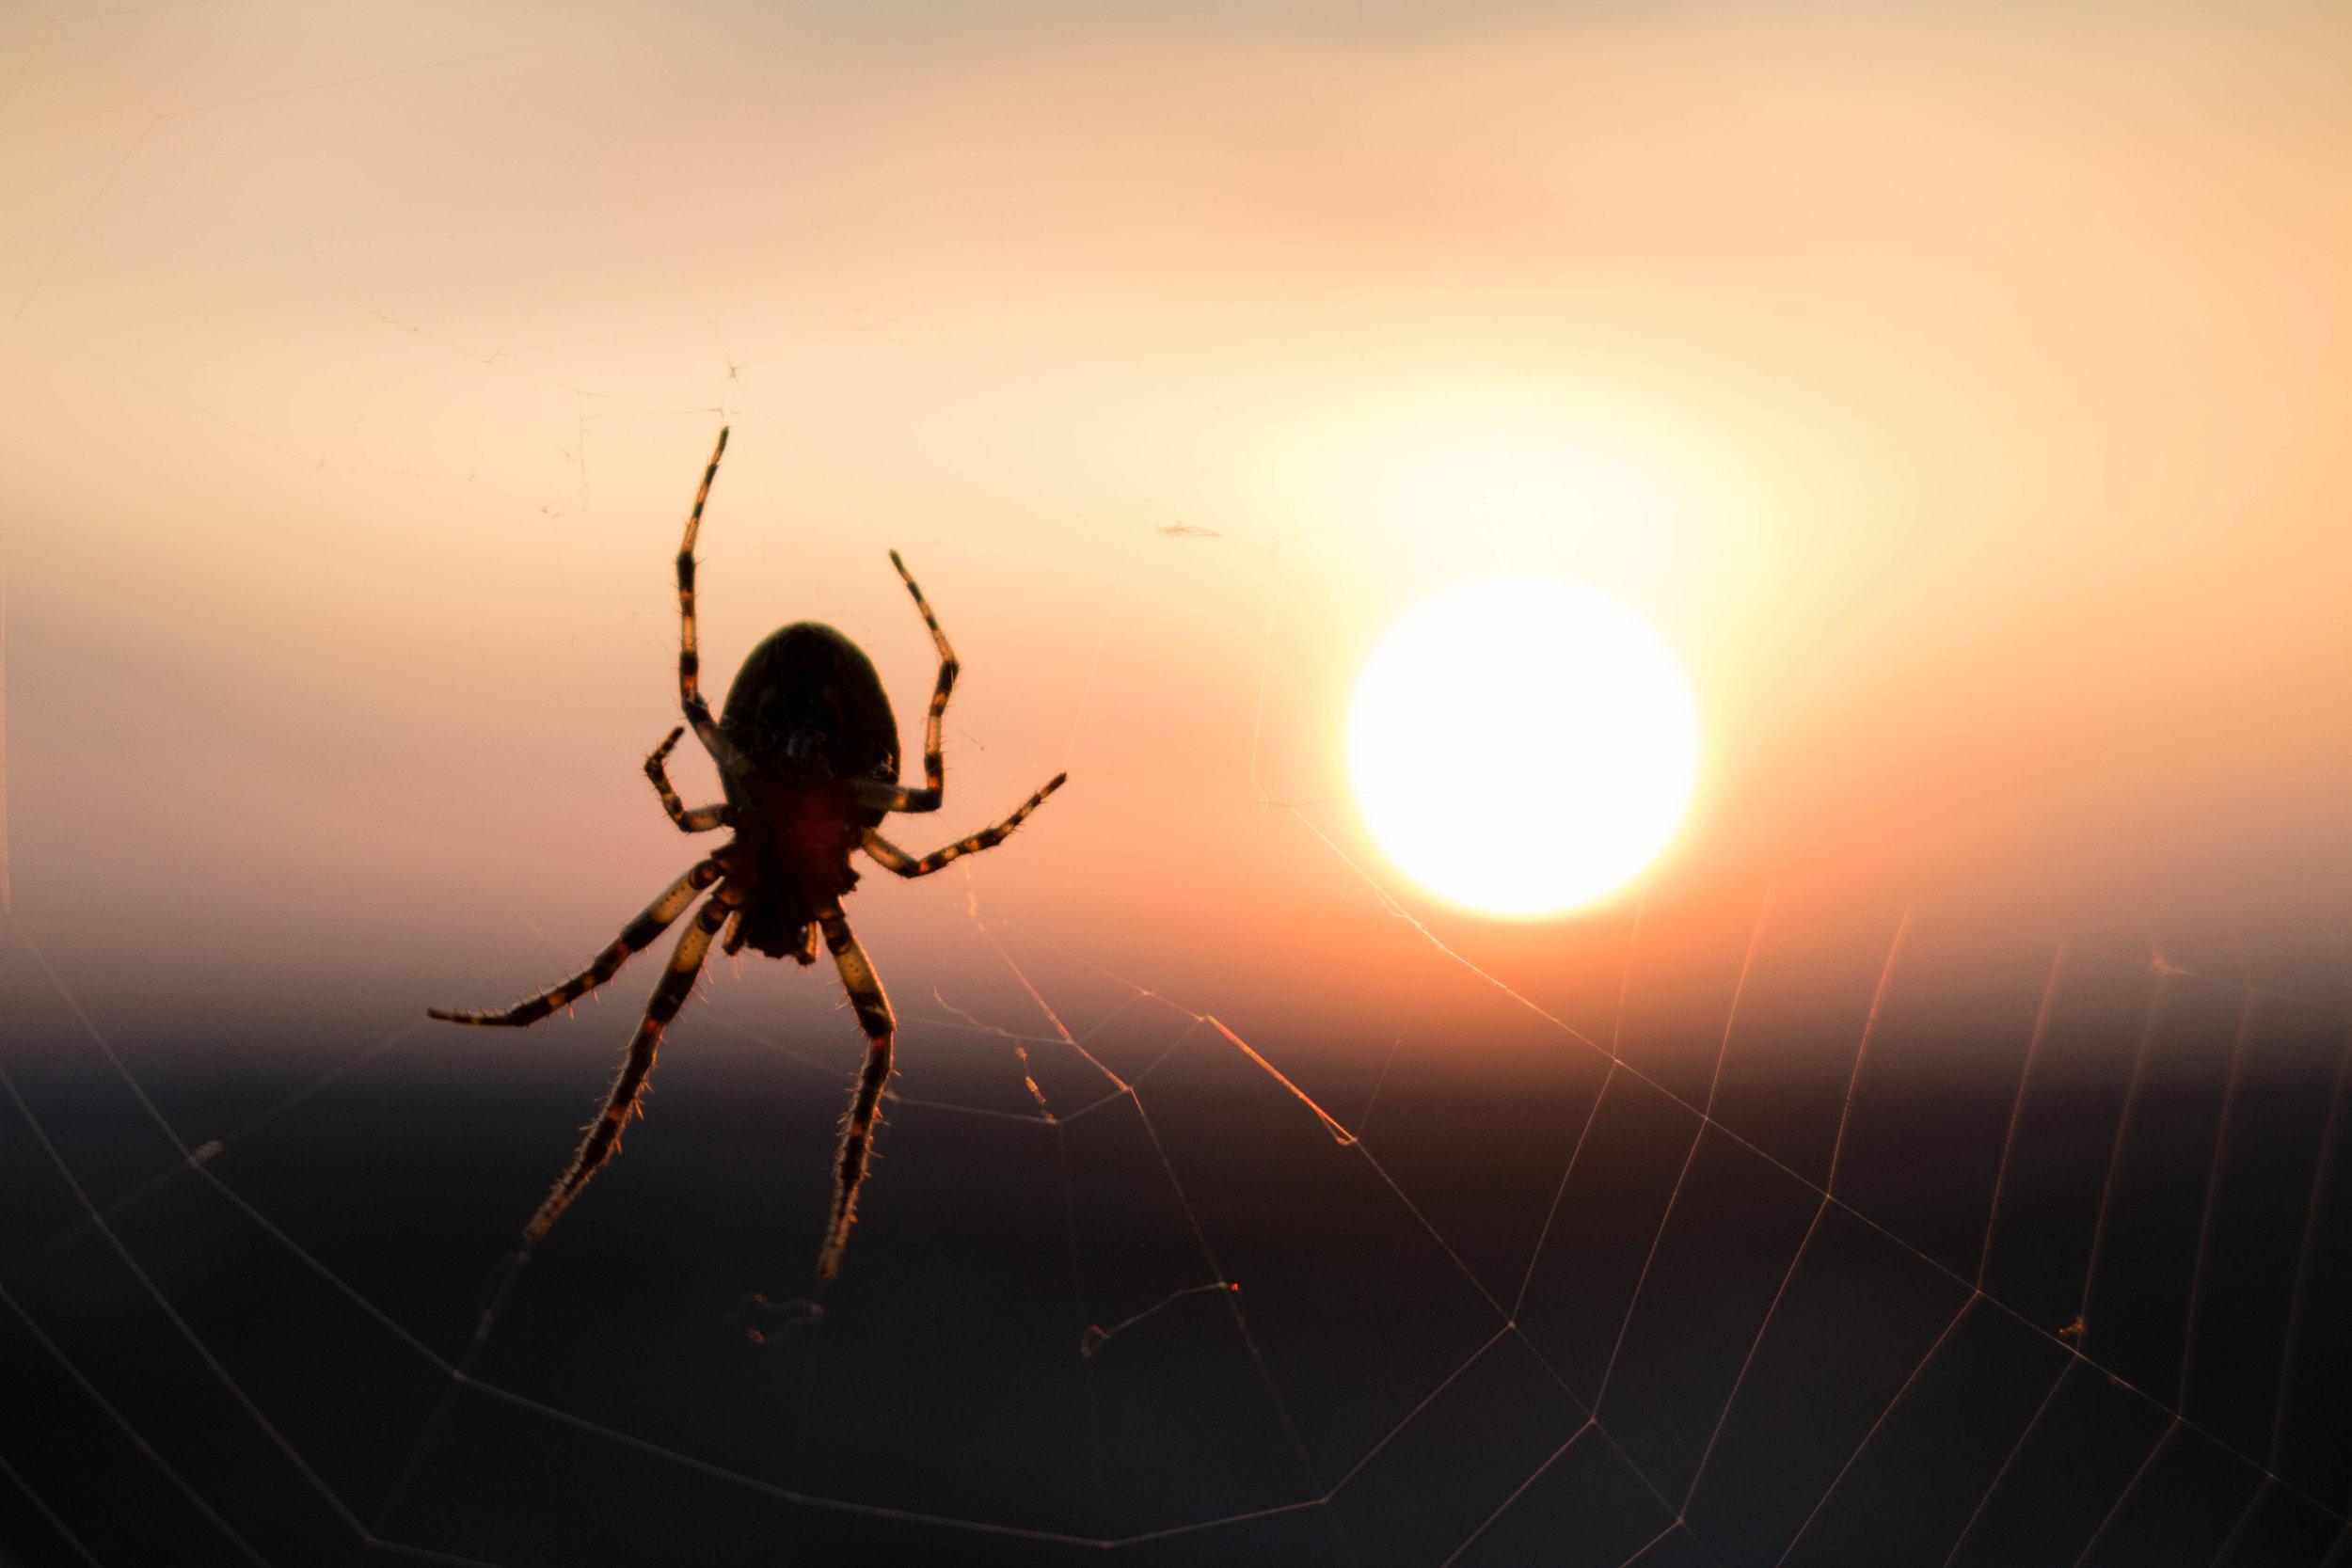 Spider-Sunset-Niagara-Falls-Canada-Photography